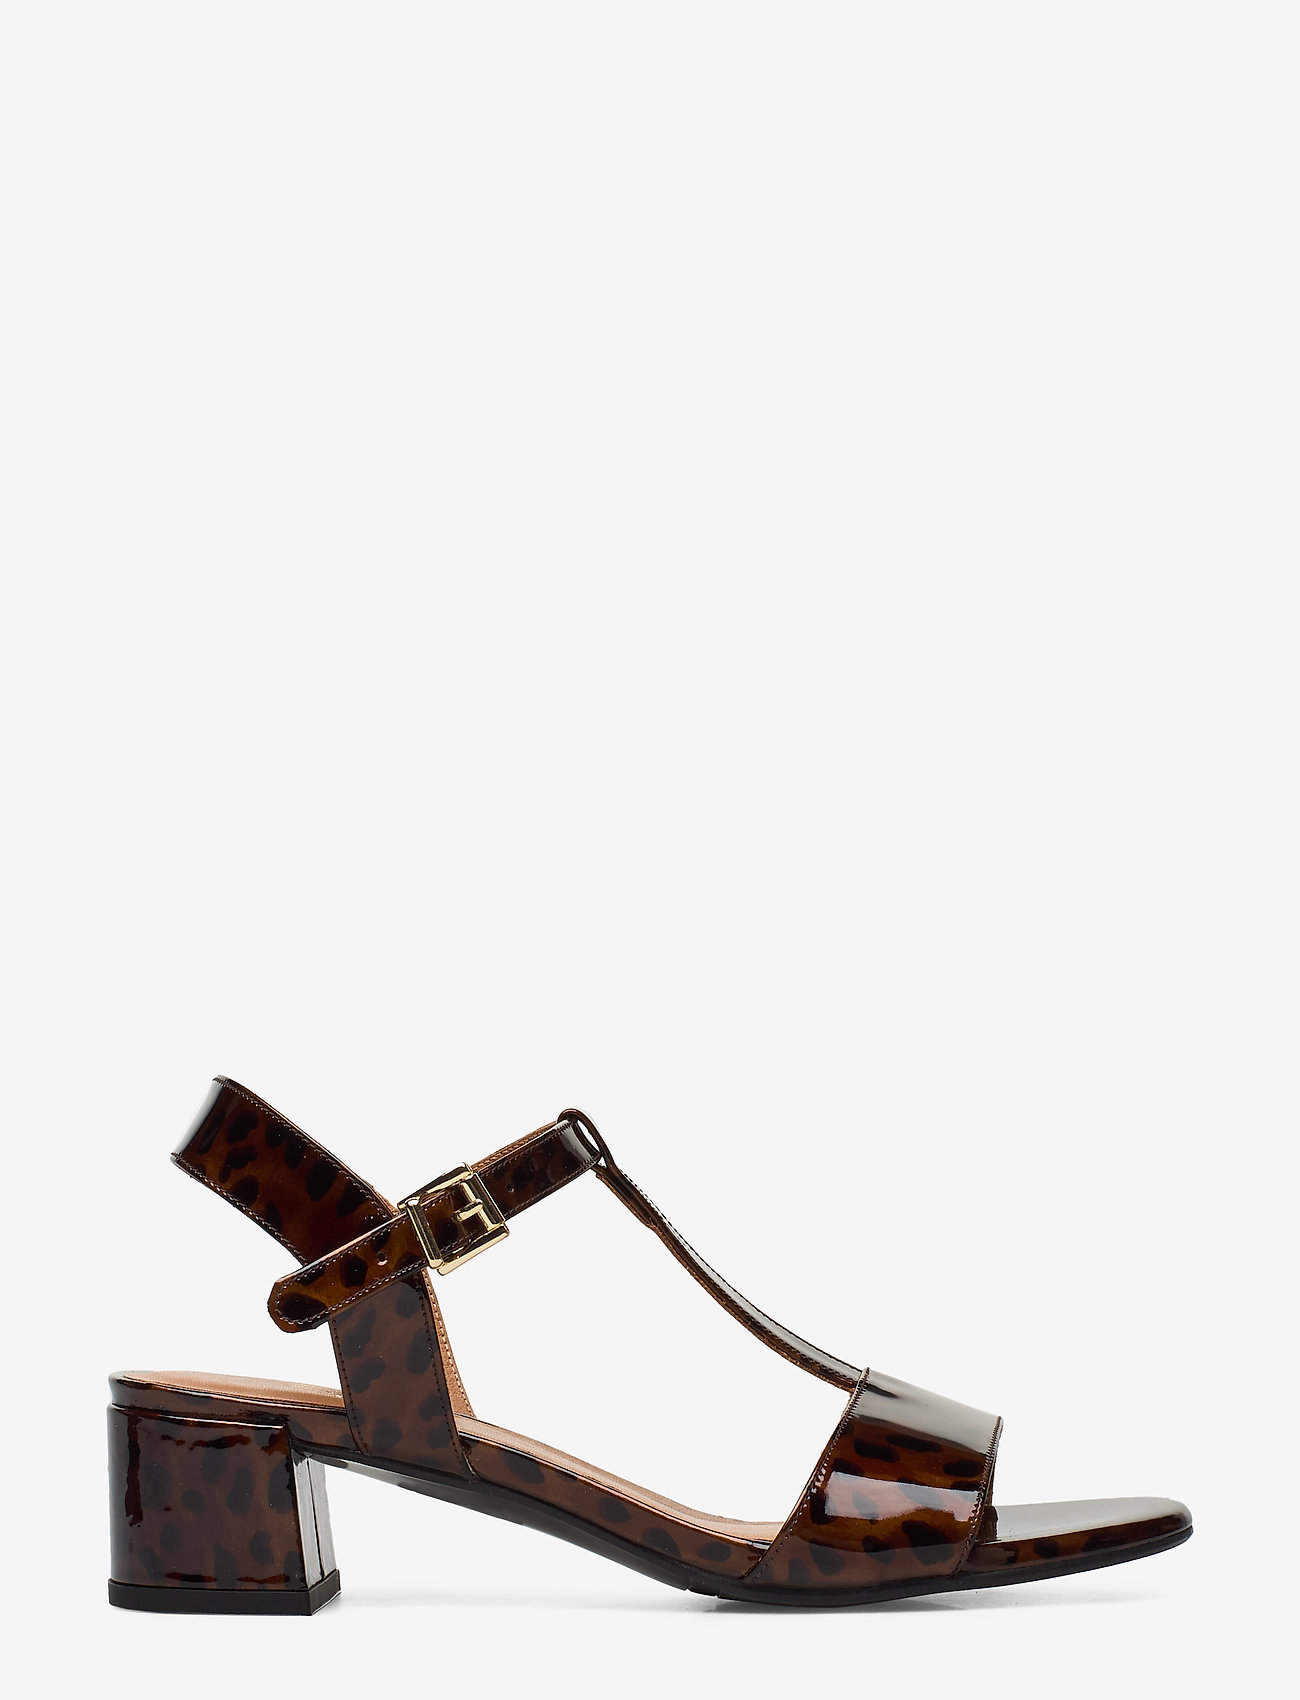 Sandals 4606 (Coated Leo 942) - Billi Bi